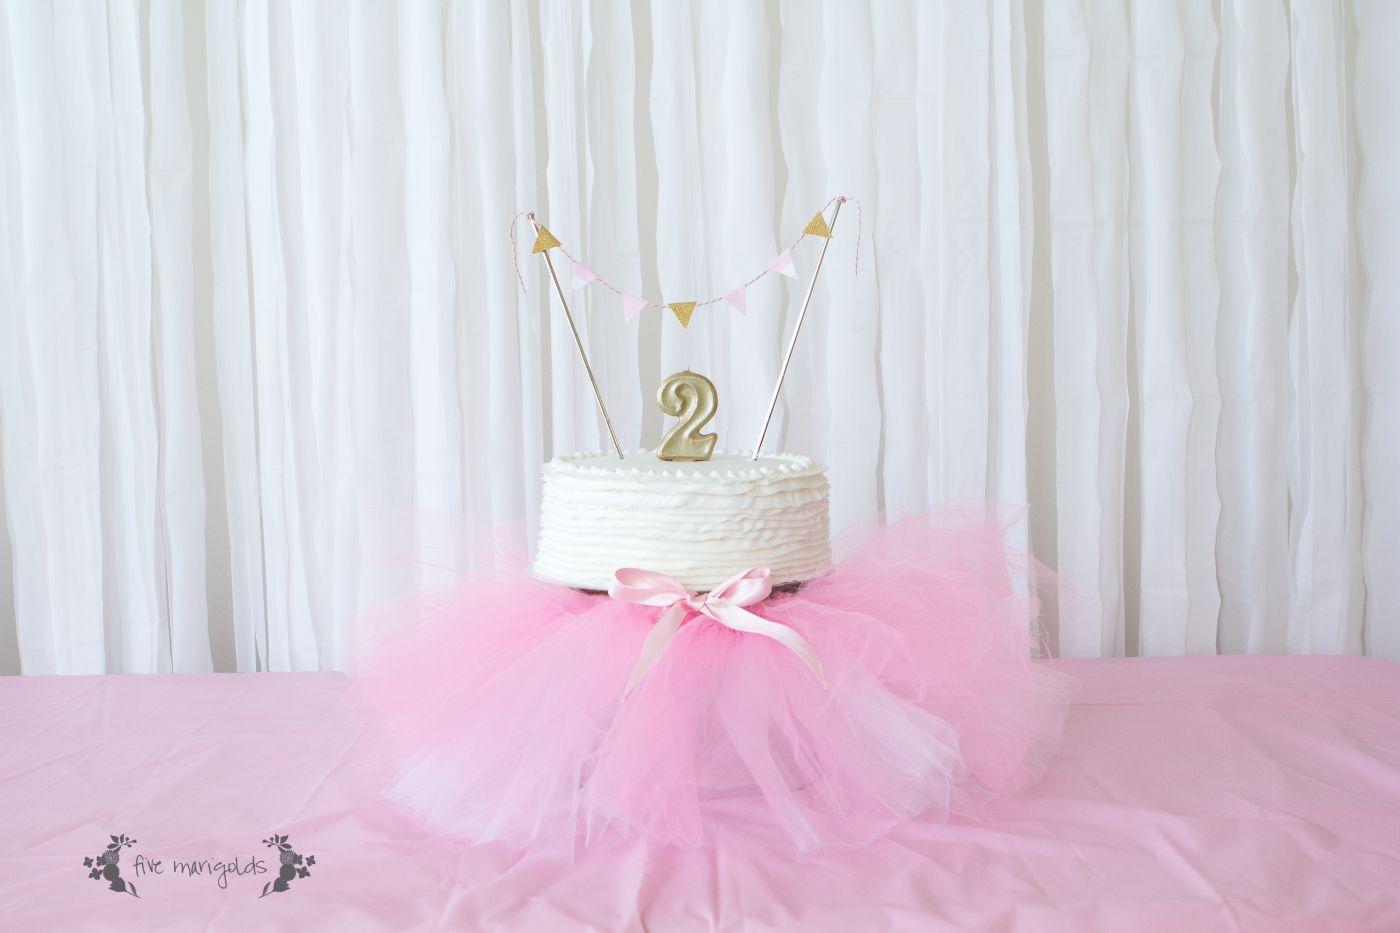 Enjoyable Pink Tutu Ballerina Birthday Party Cake Plate And Decorations Personalised Birthday Cards Akebfashionlily Jamesorg